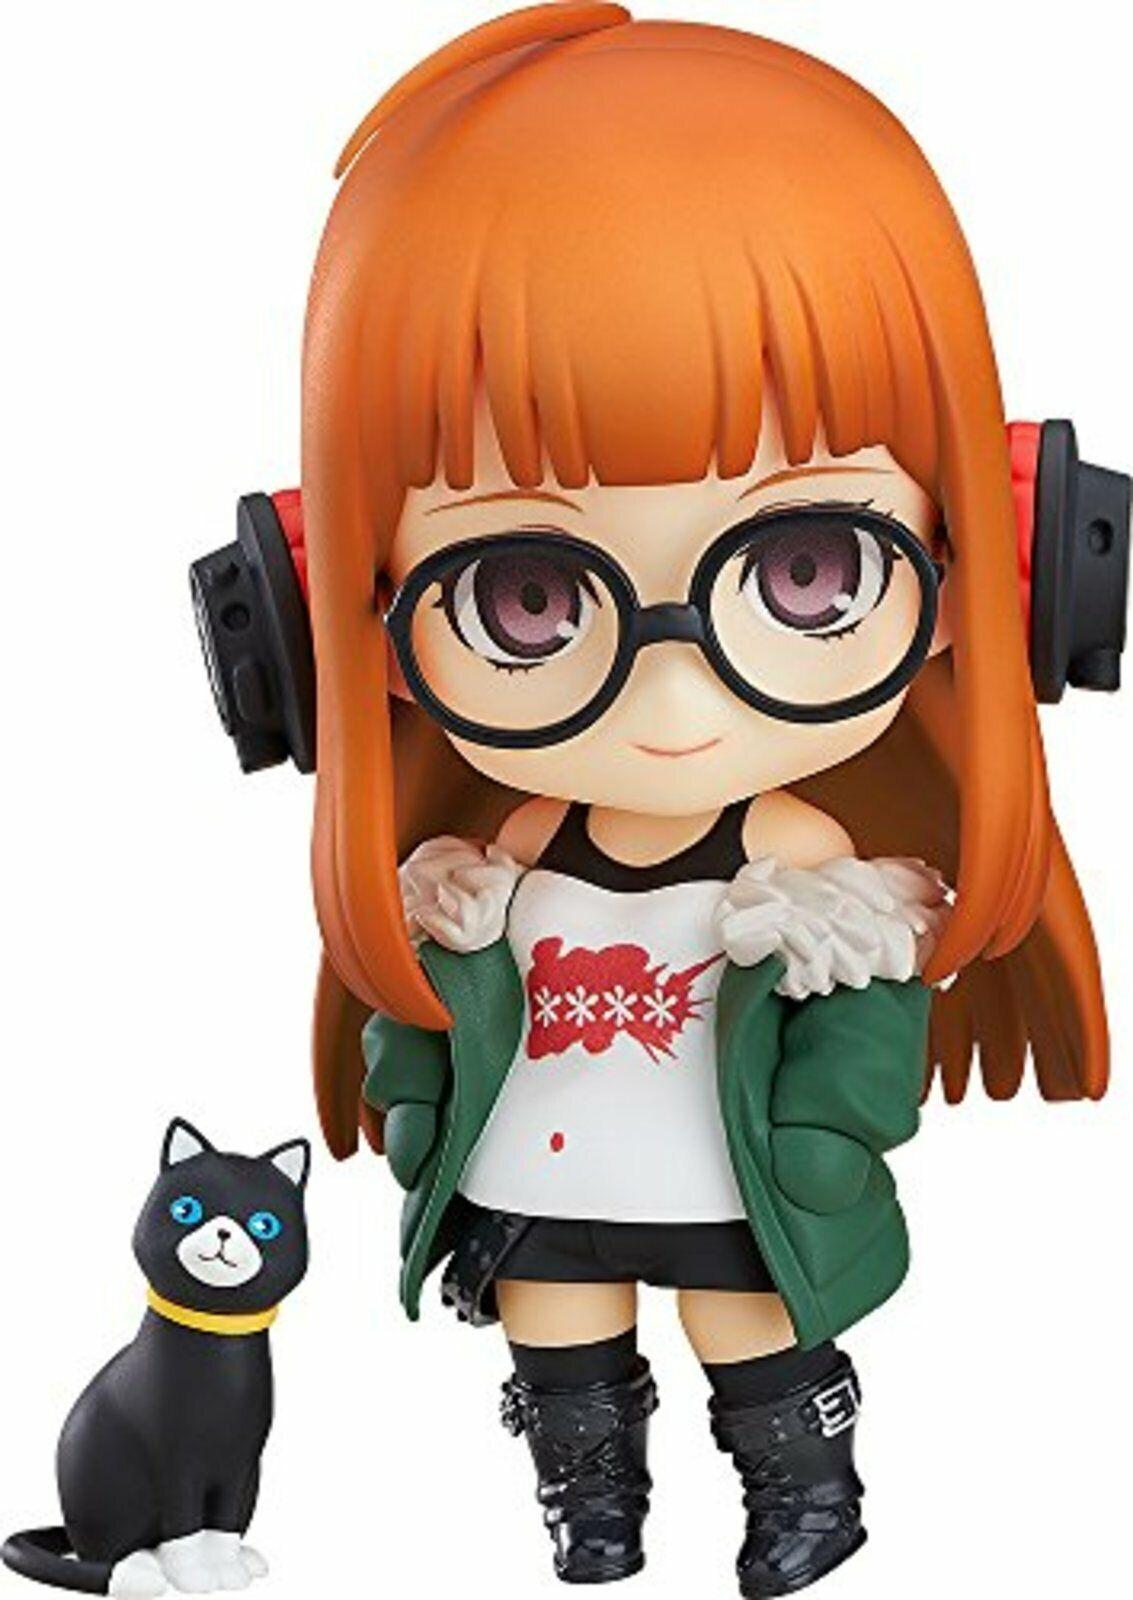 Nendorid Persona 5 Sakura Futaba  Anti Echelle ABS & PVC Peint Mobiliers  à vendre en ligne